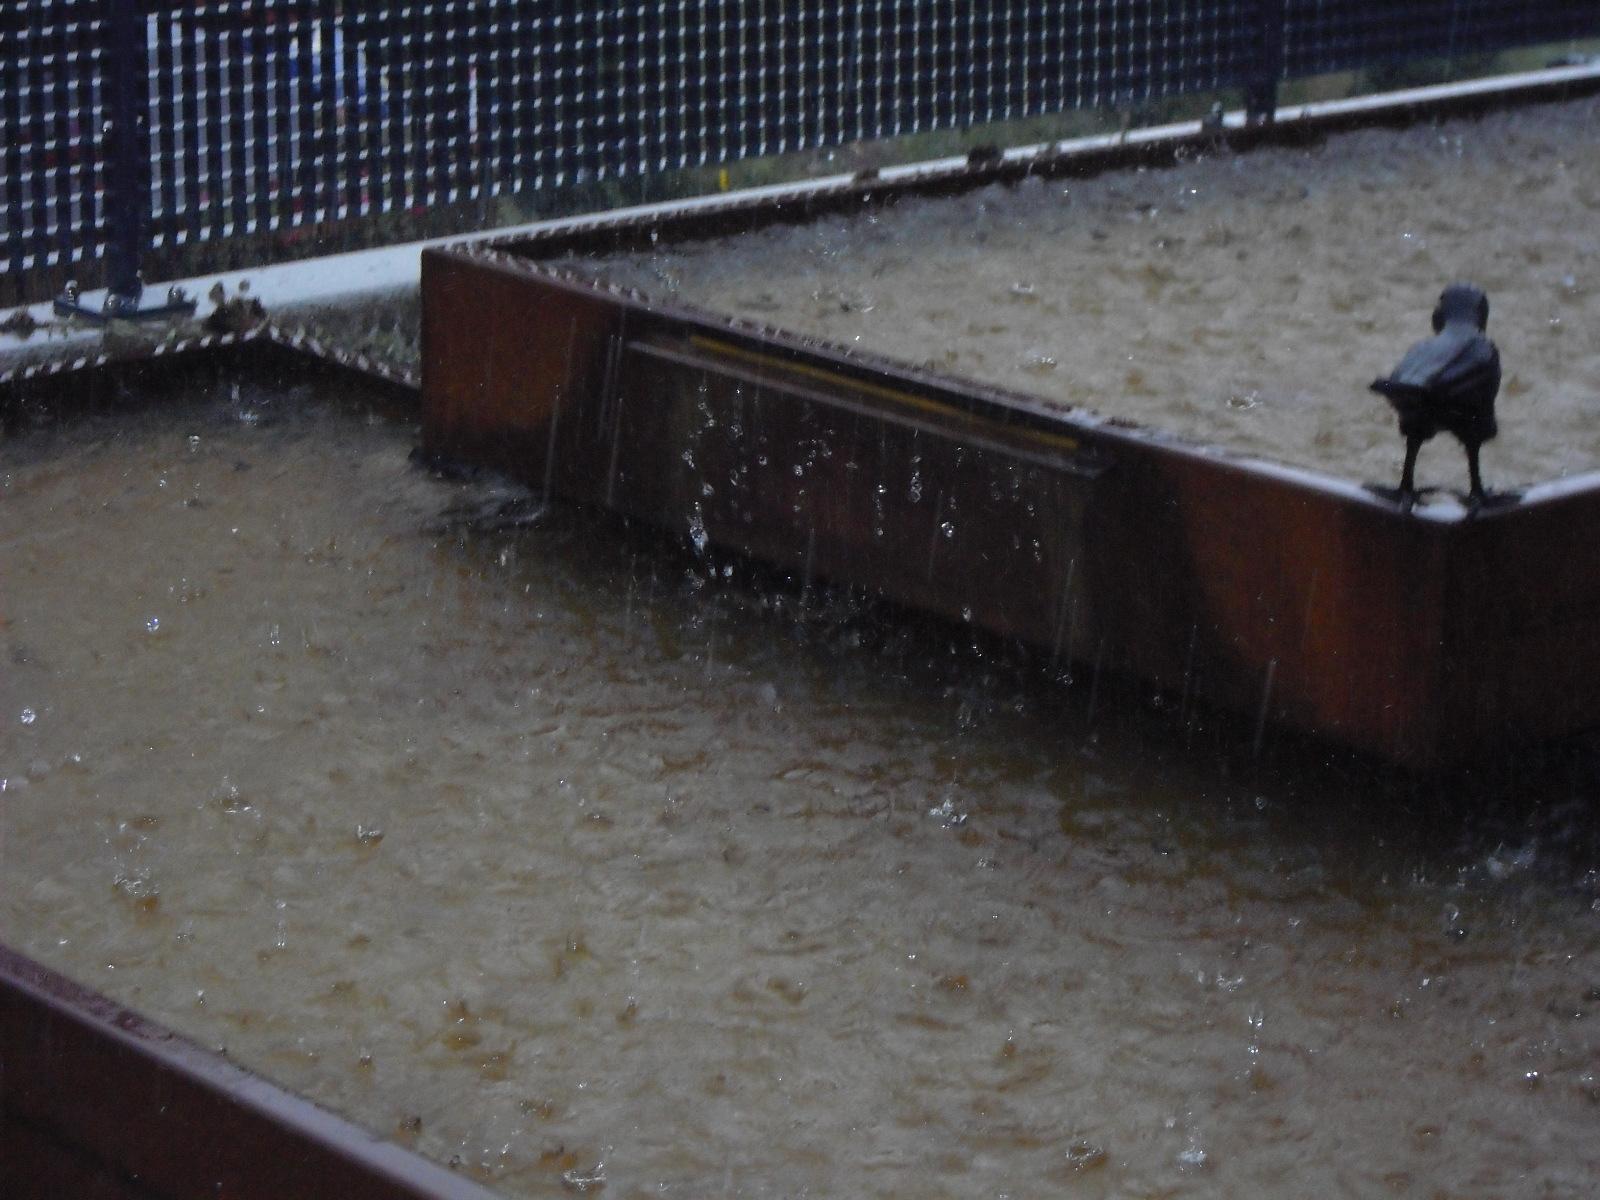 Juli / Willkommener Regen ... 6